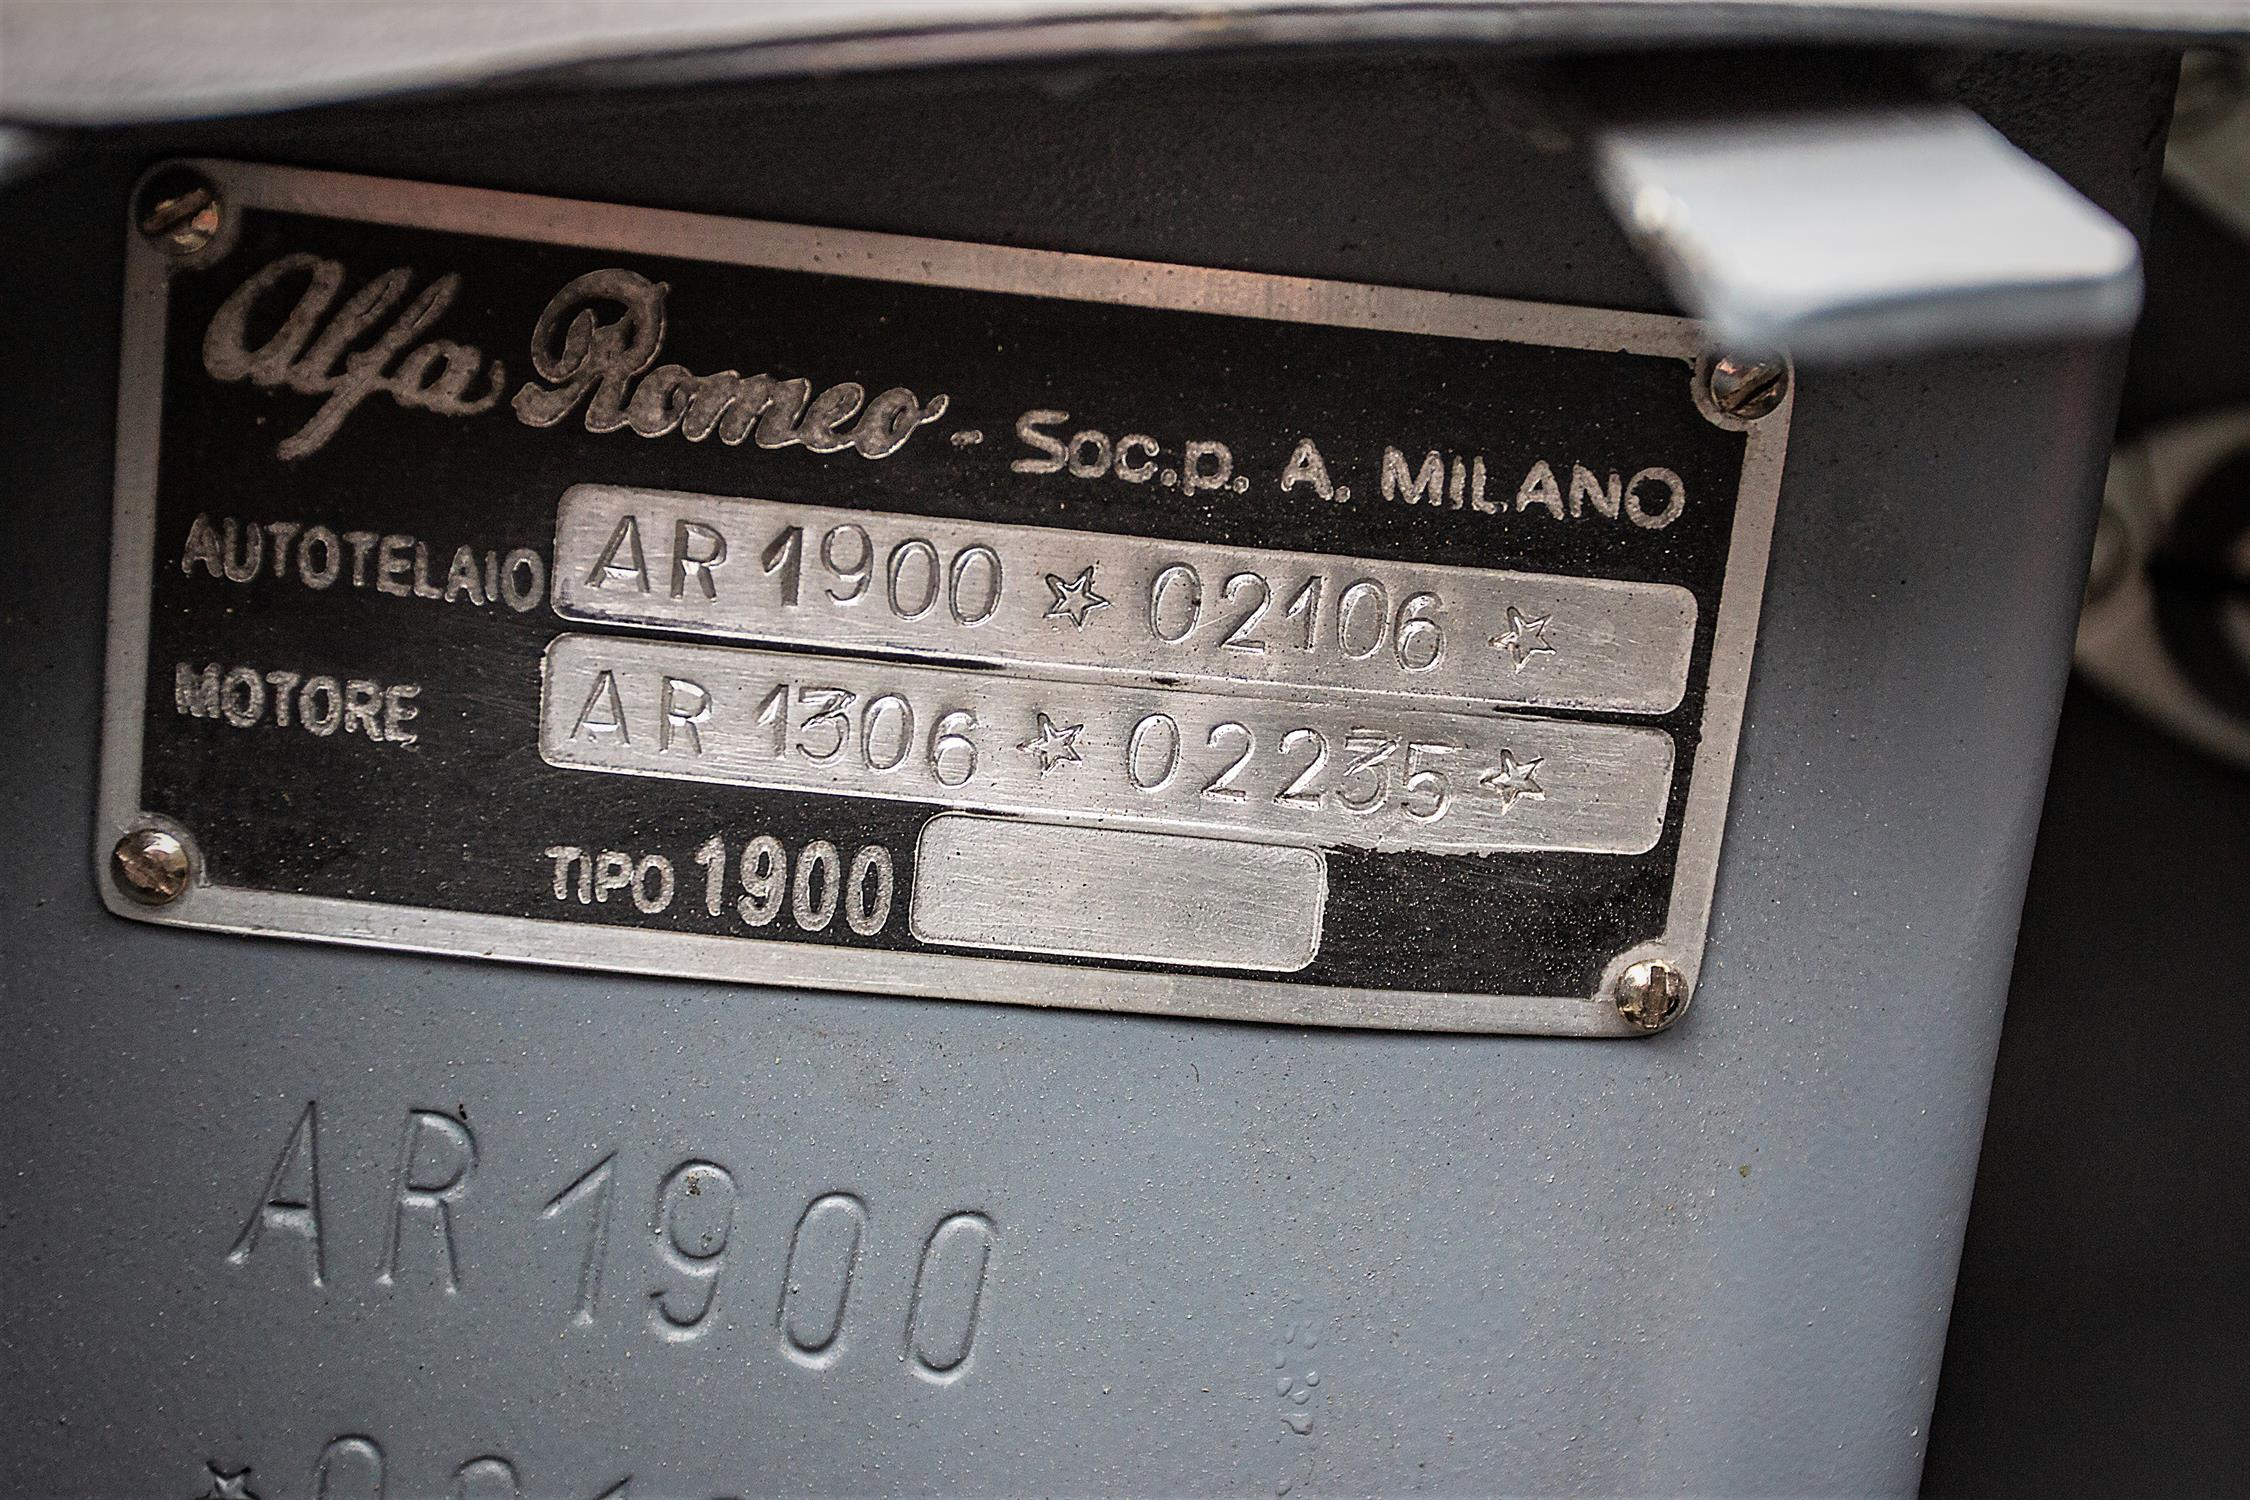 1952 Alfa 1900 ATL Barchetta - Image 9 of 10